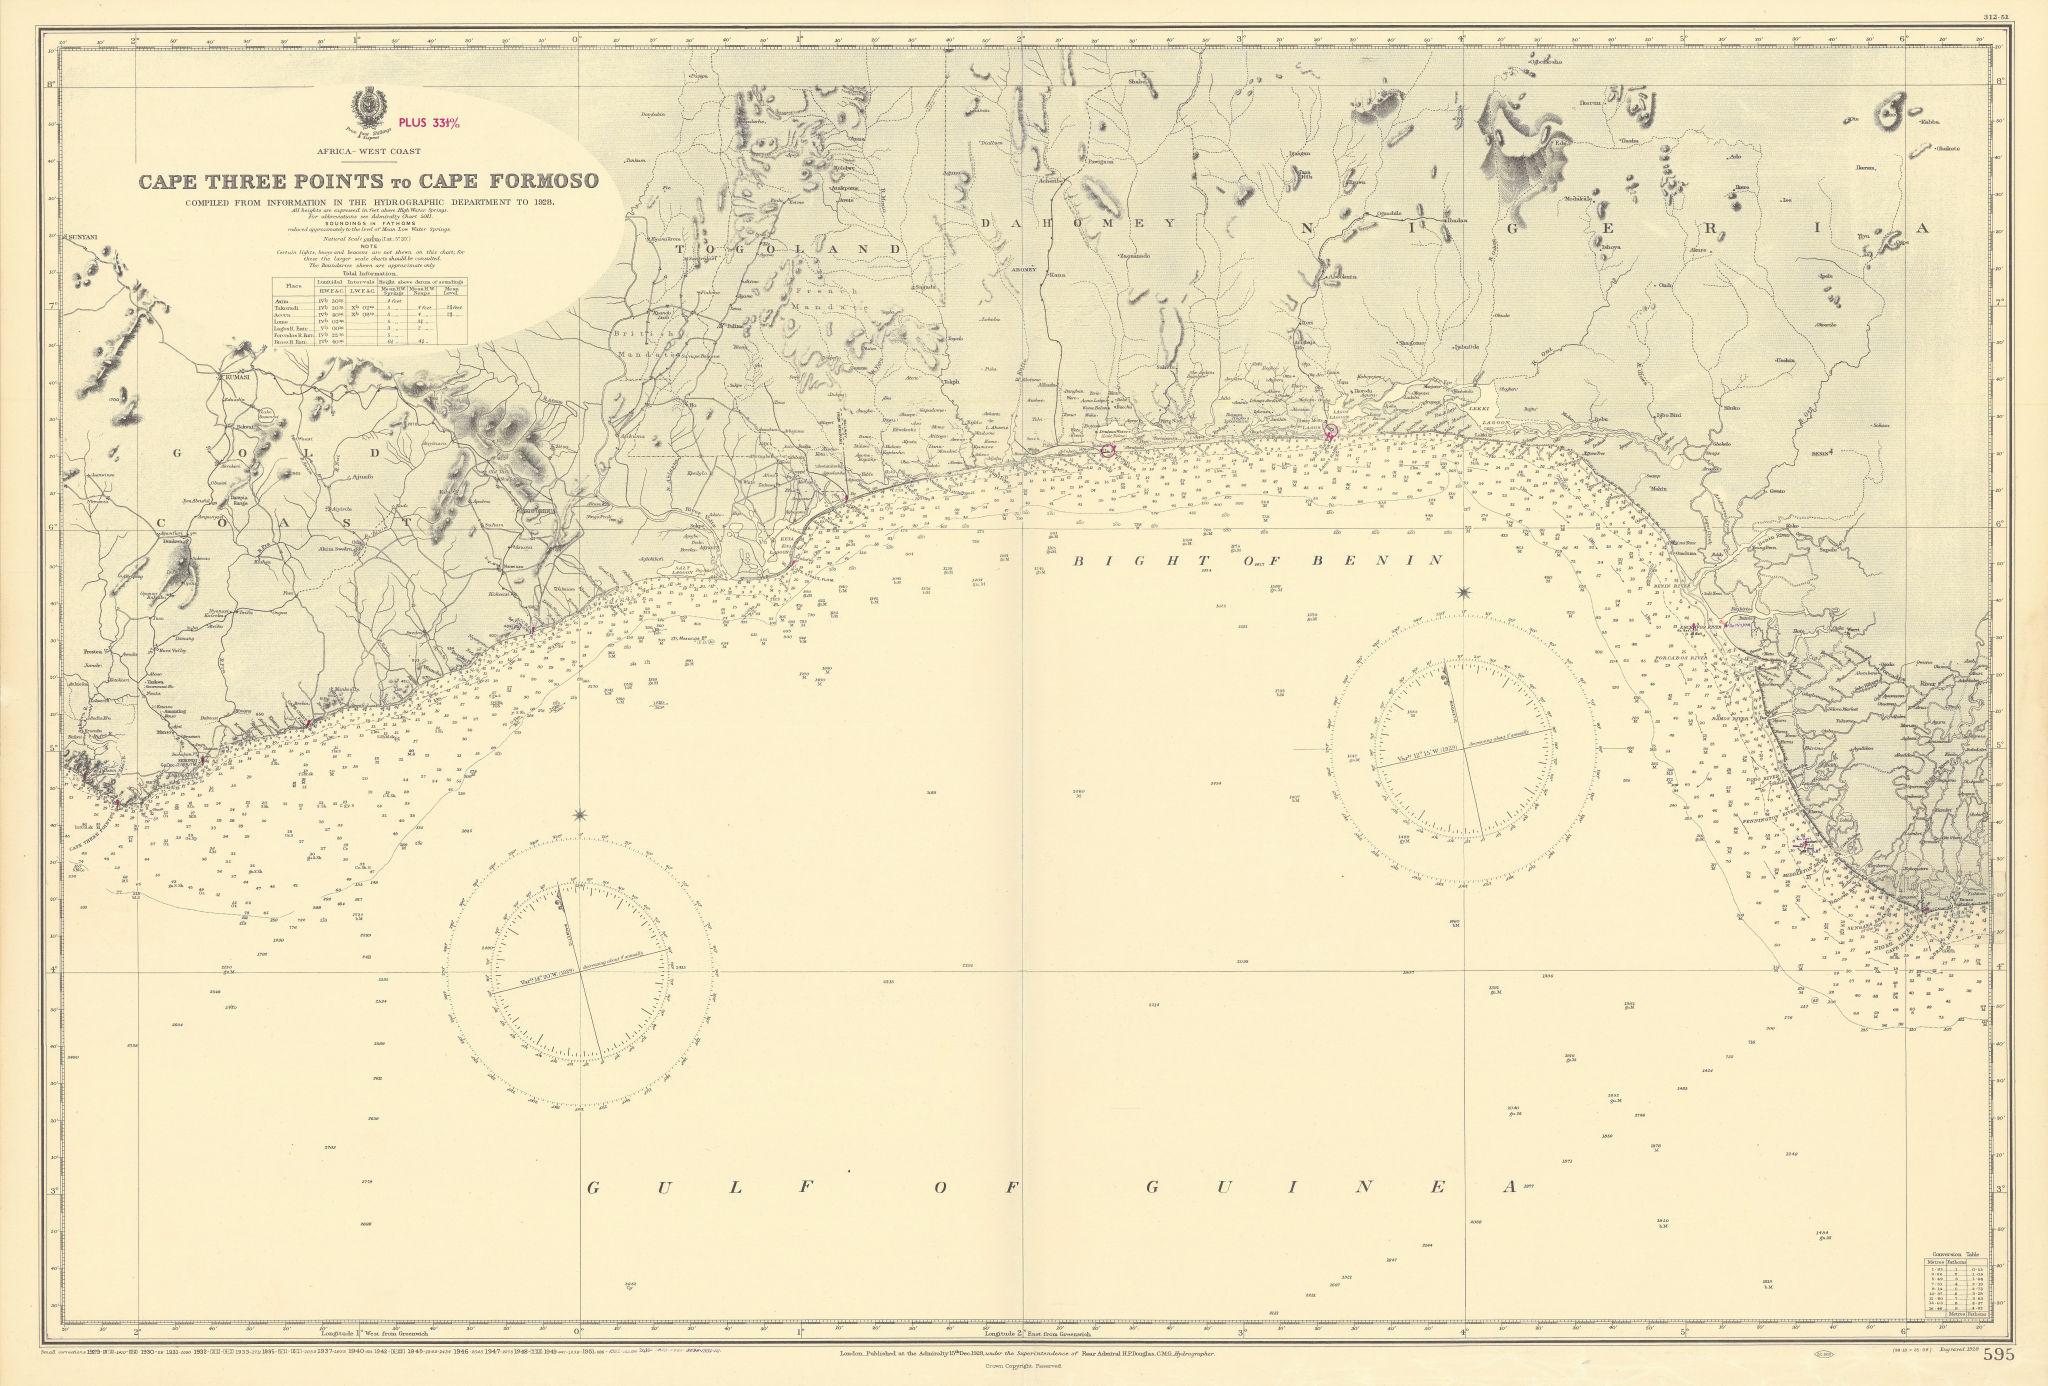 Gulf of Guinea. Ghana Togo Benin Nigeria. ADMIRALTY sea chart 1928 (1954) map